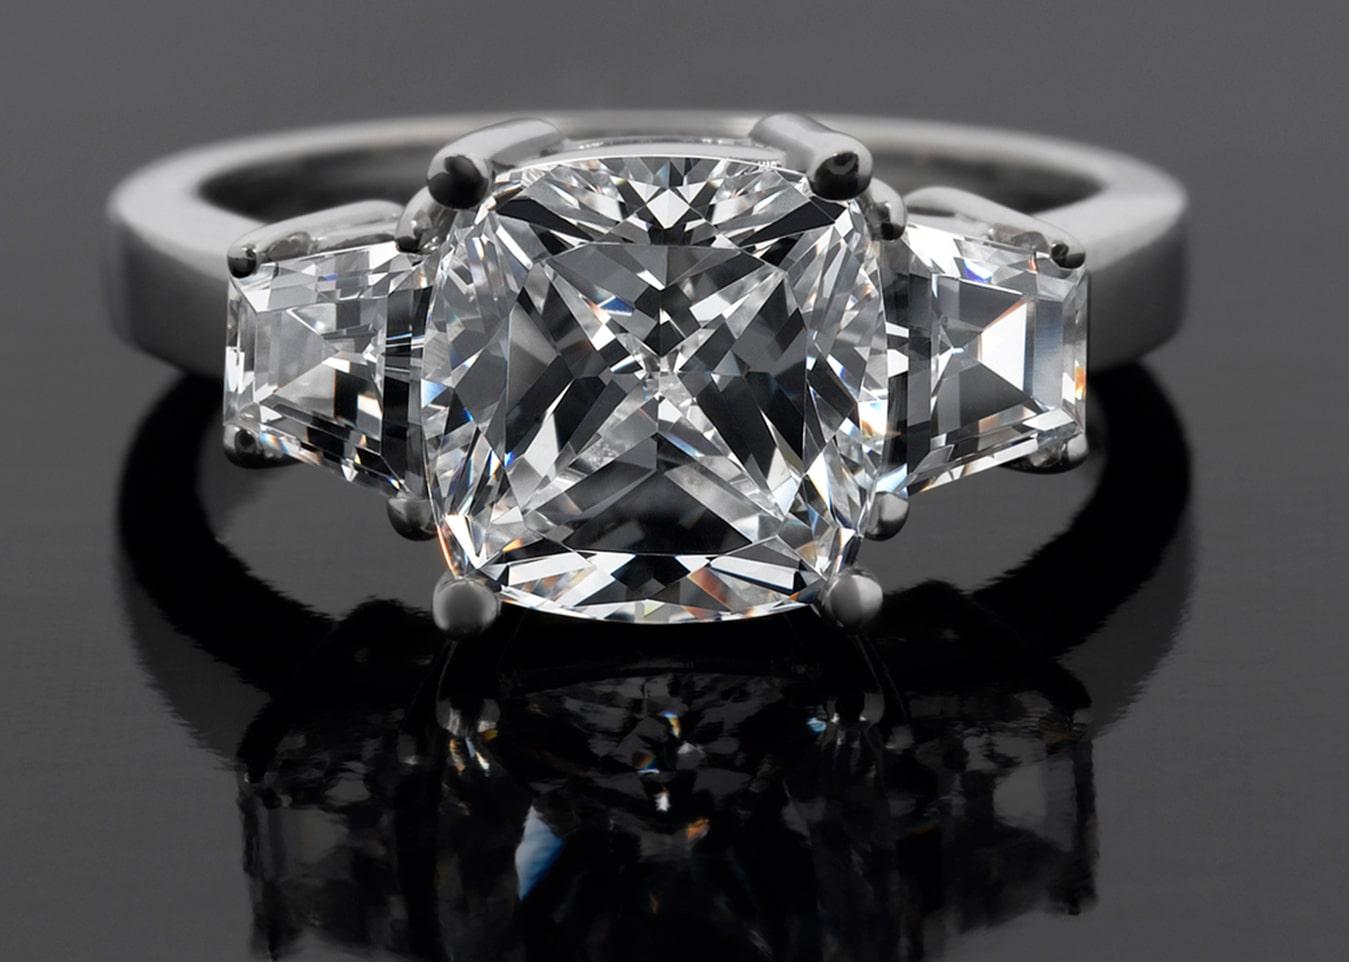 Jewelry Seo Company